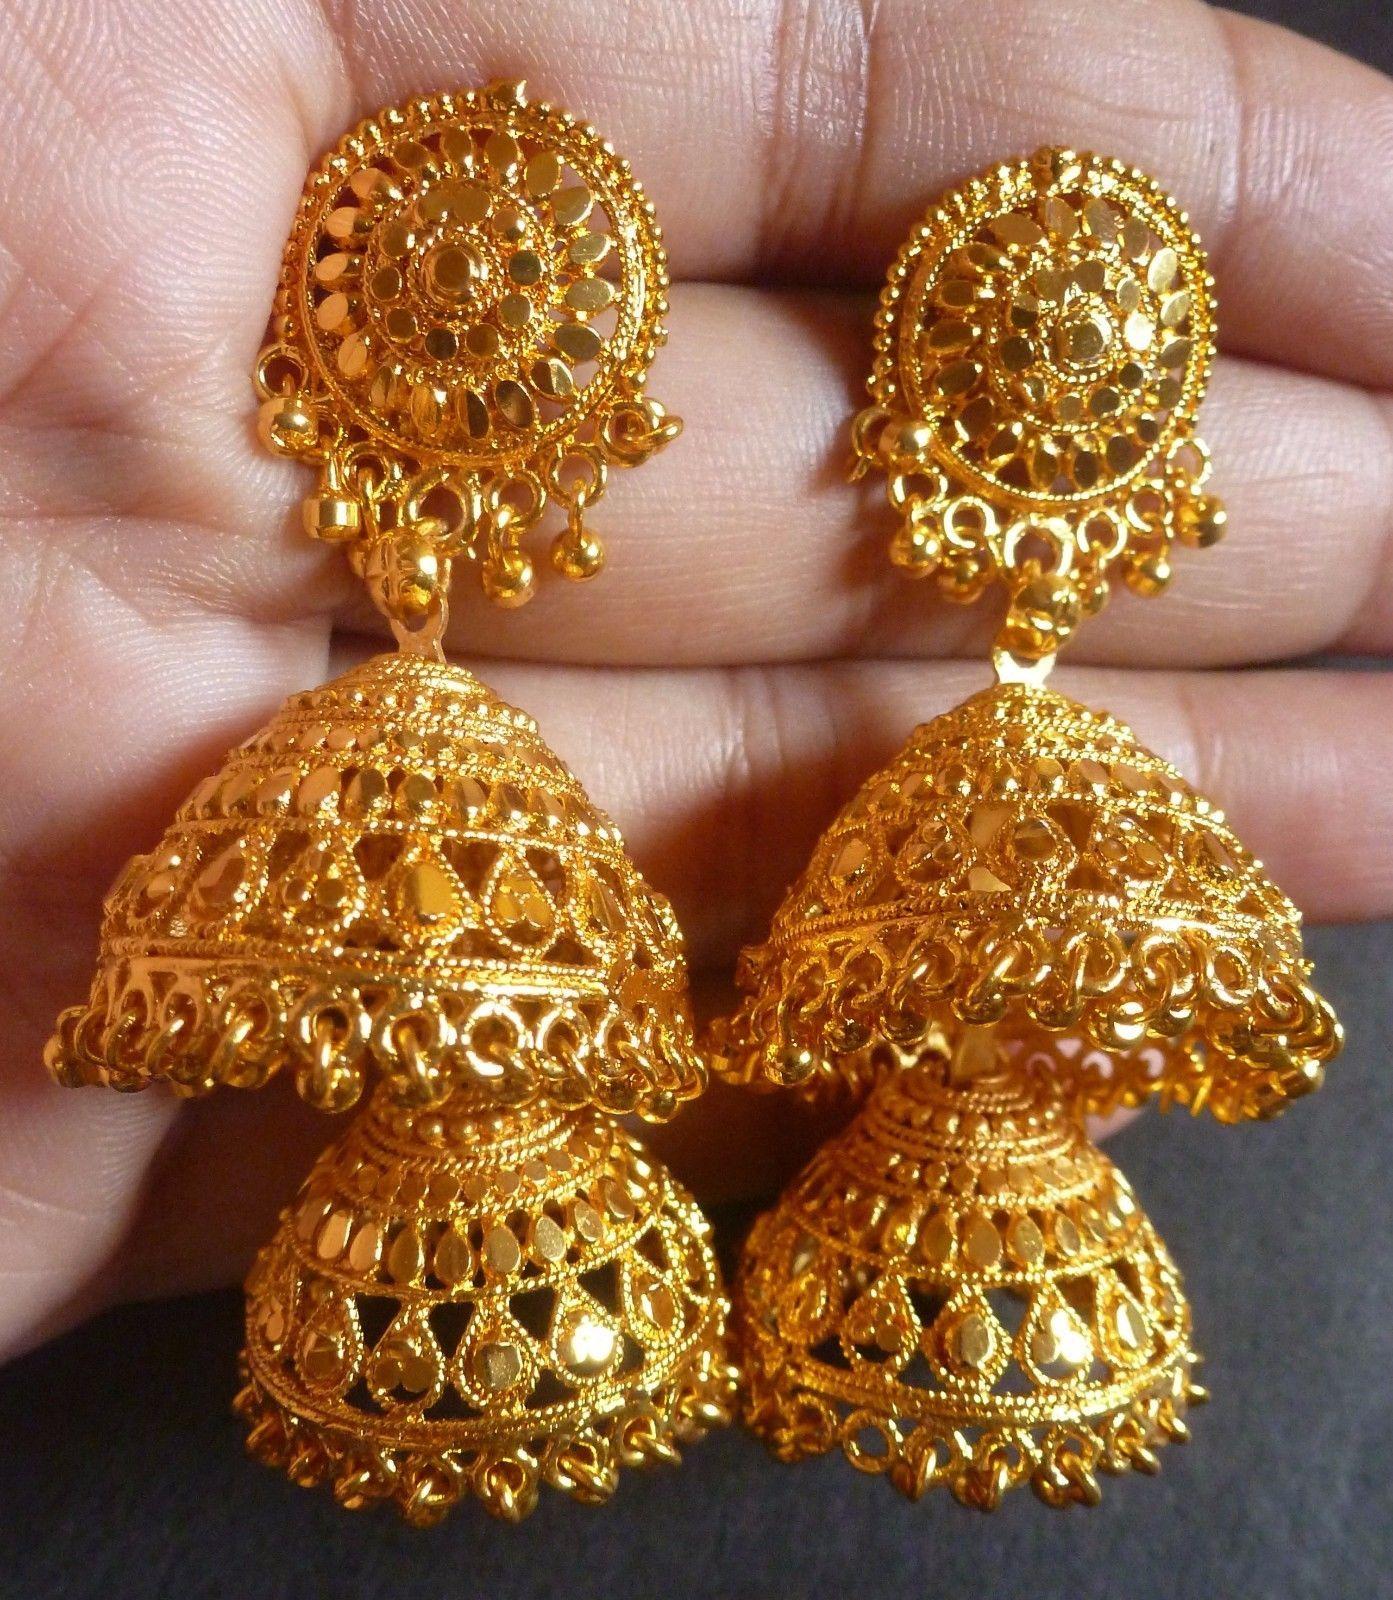 633dbfb53 22K Gold Plated 5 Cm Long 2 Steps Indian Wedding Ball Bead Jhumka Earrings  Set